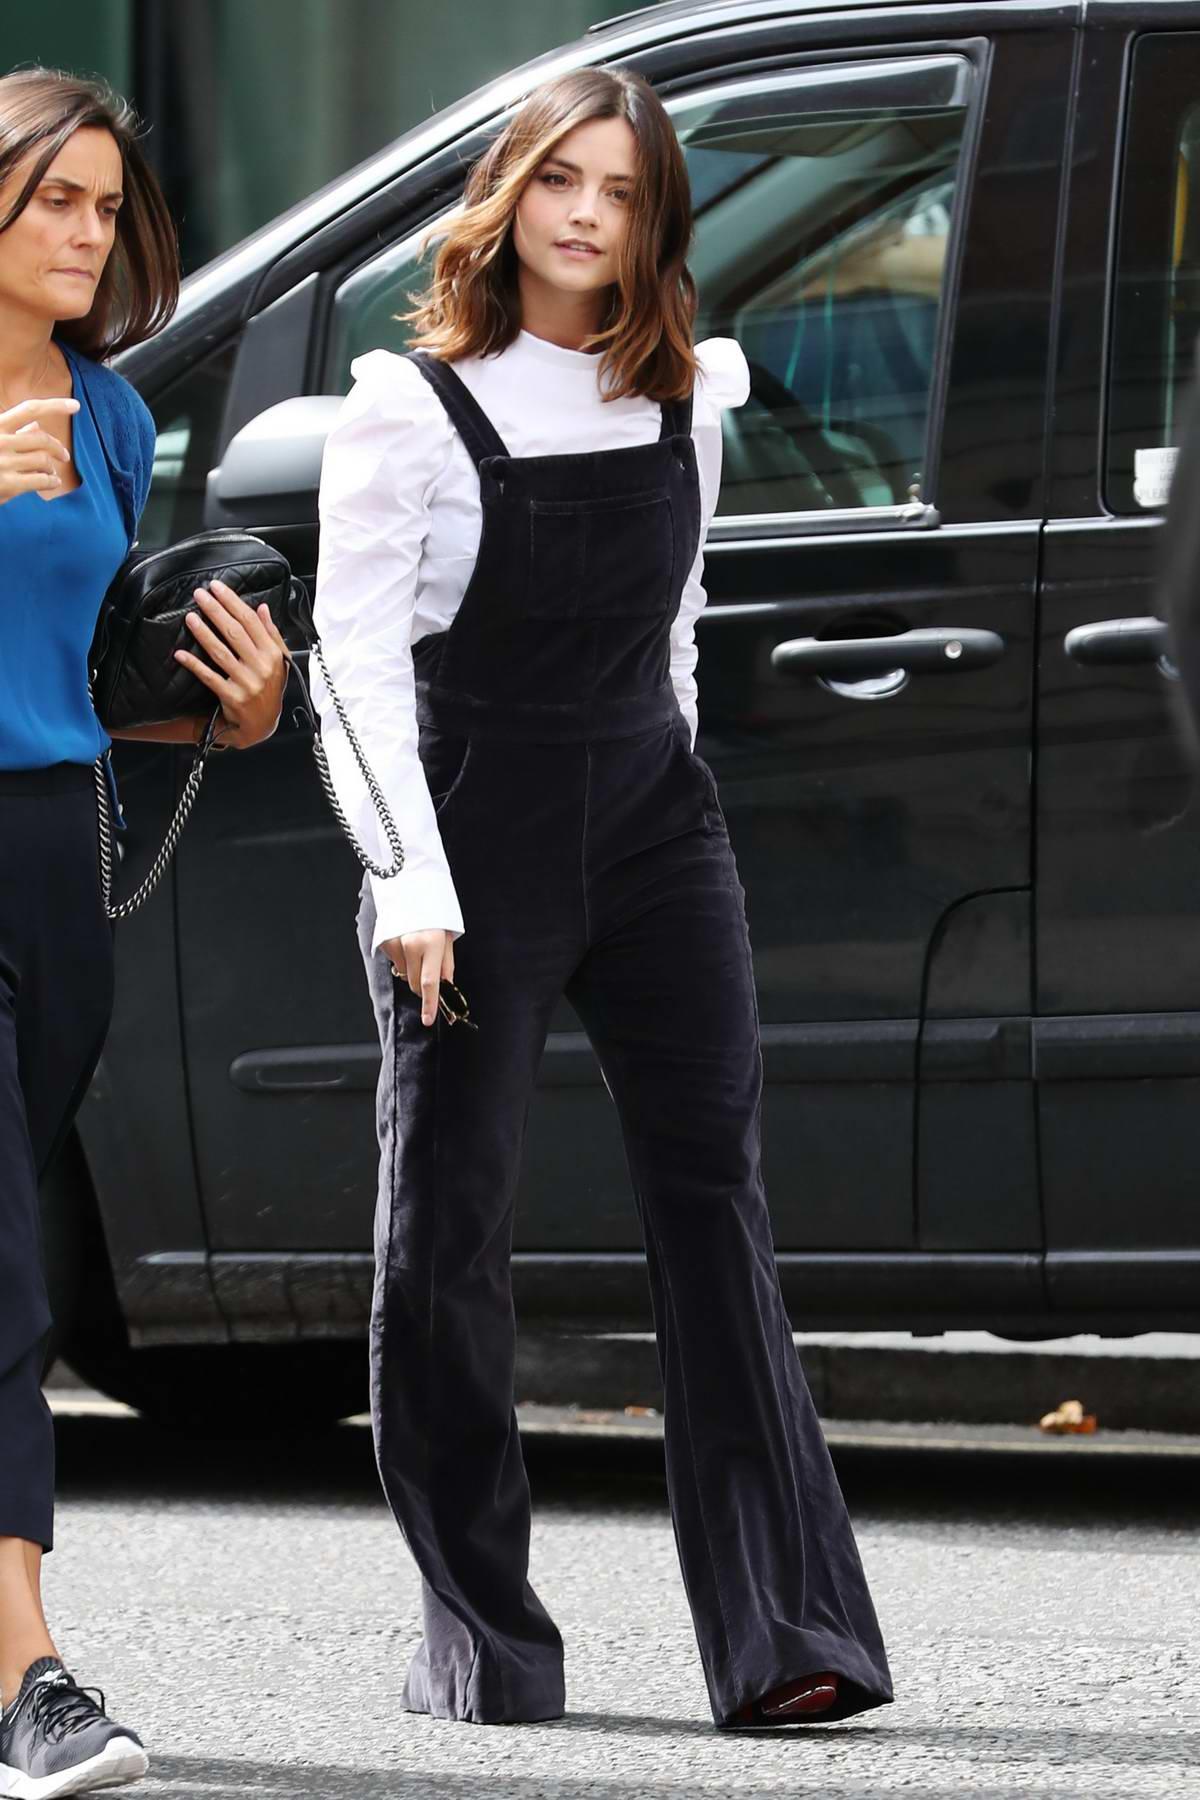 Jenna Coleman visiting BBC Radio 2 in London